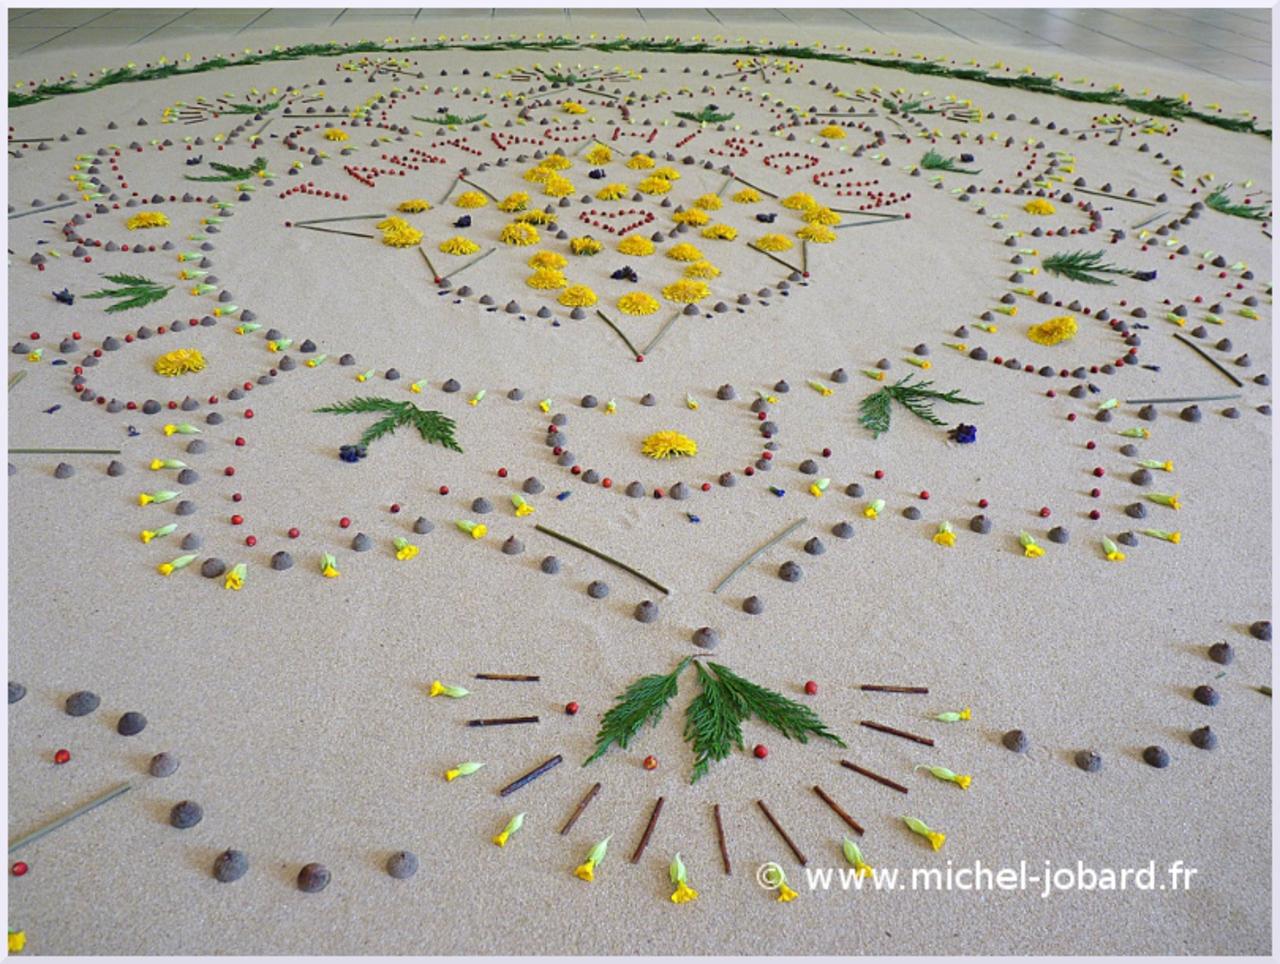 Fresque Land art Tantachisqua, Michel Jobard